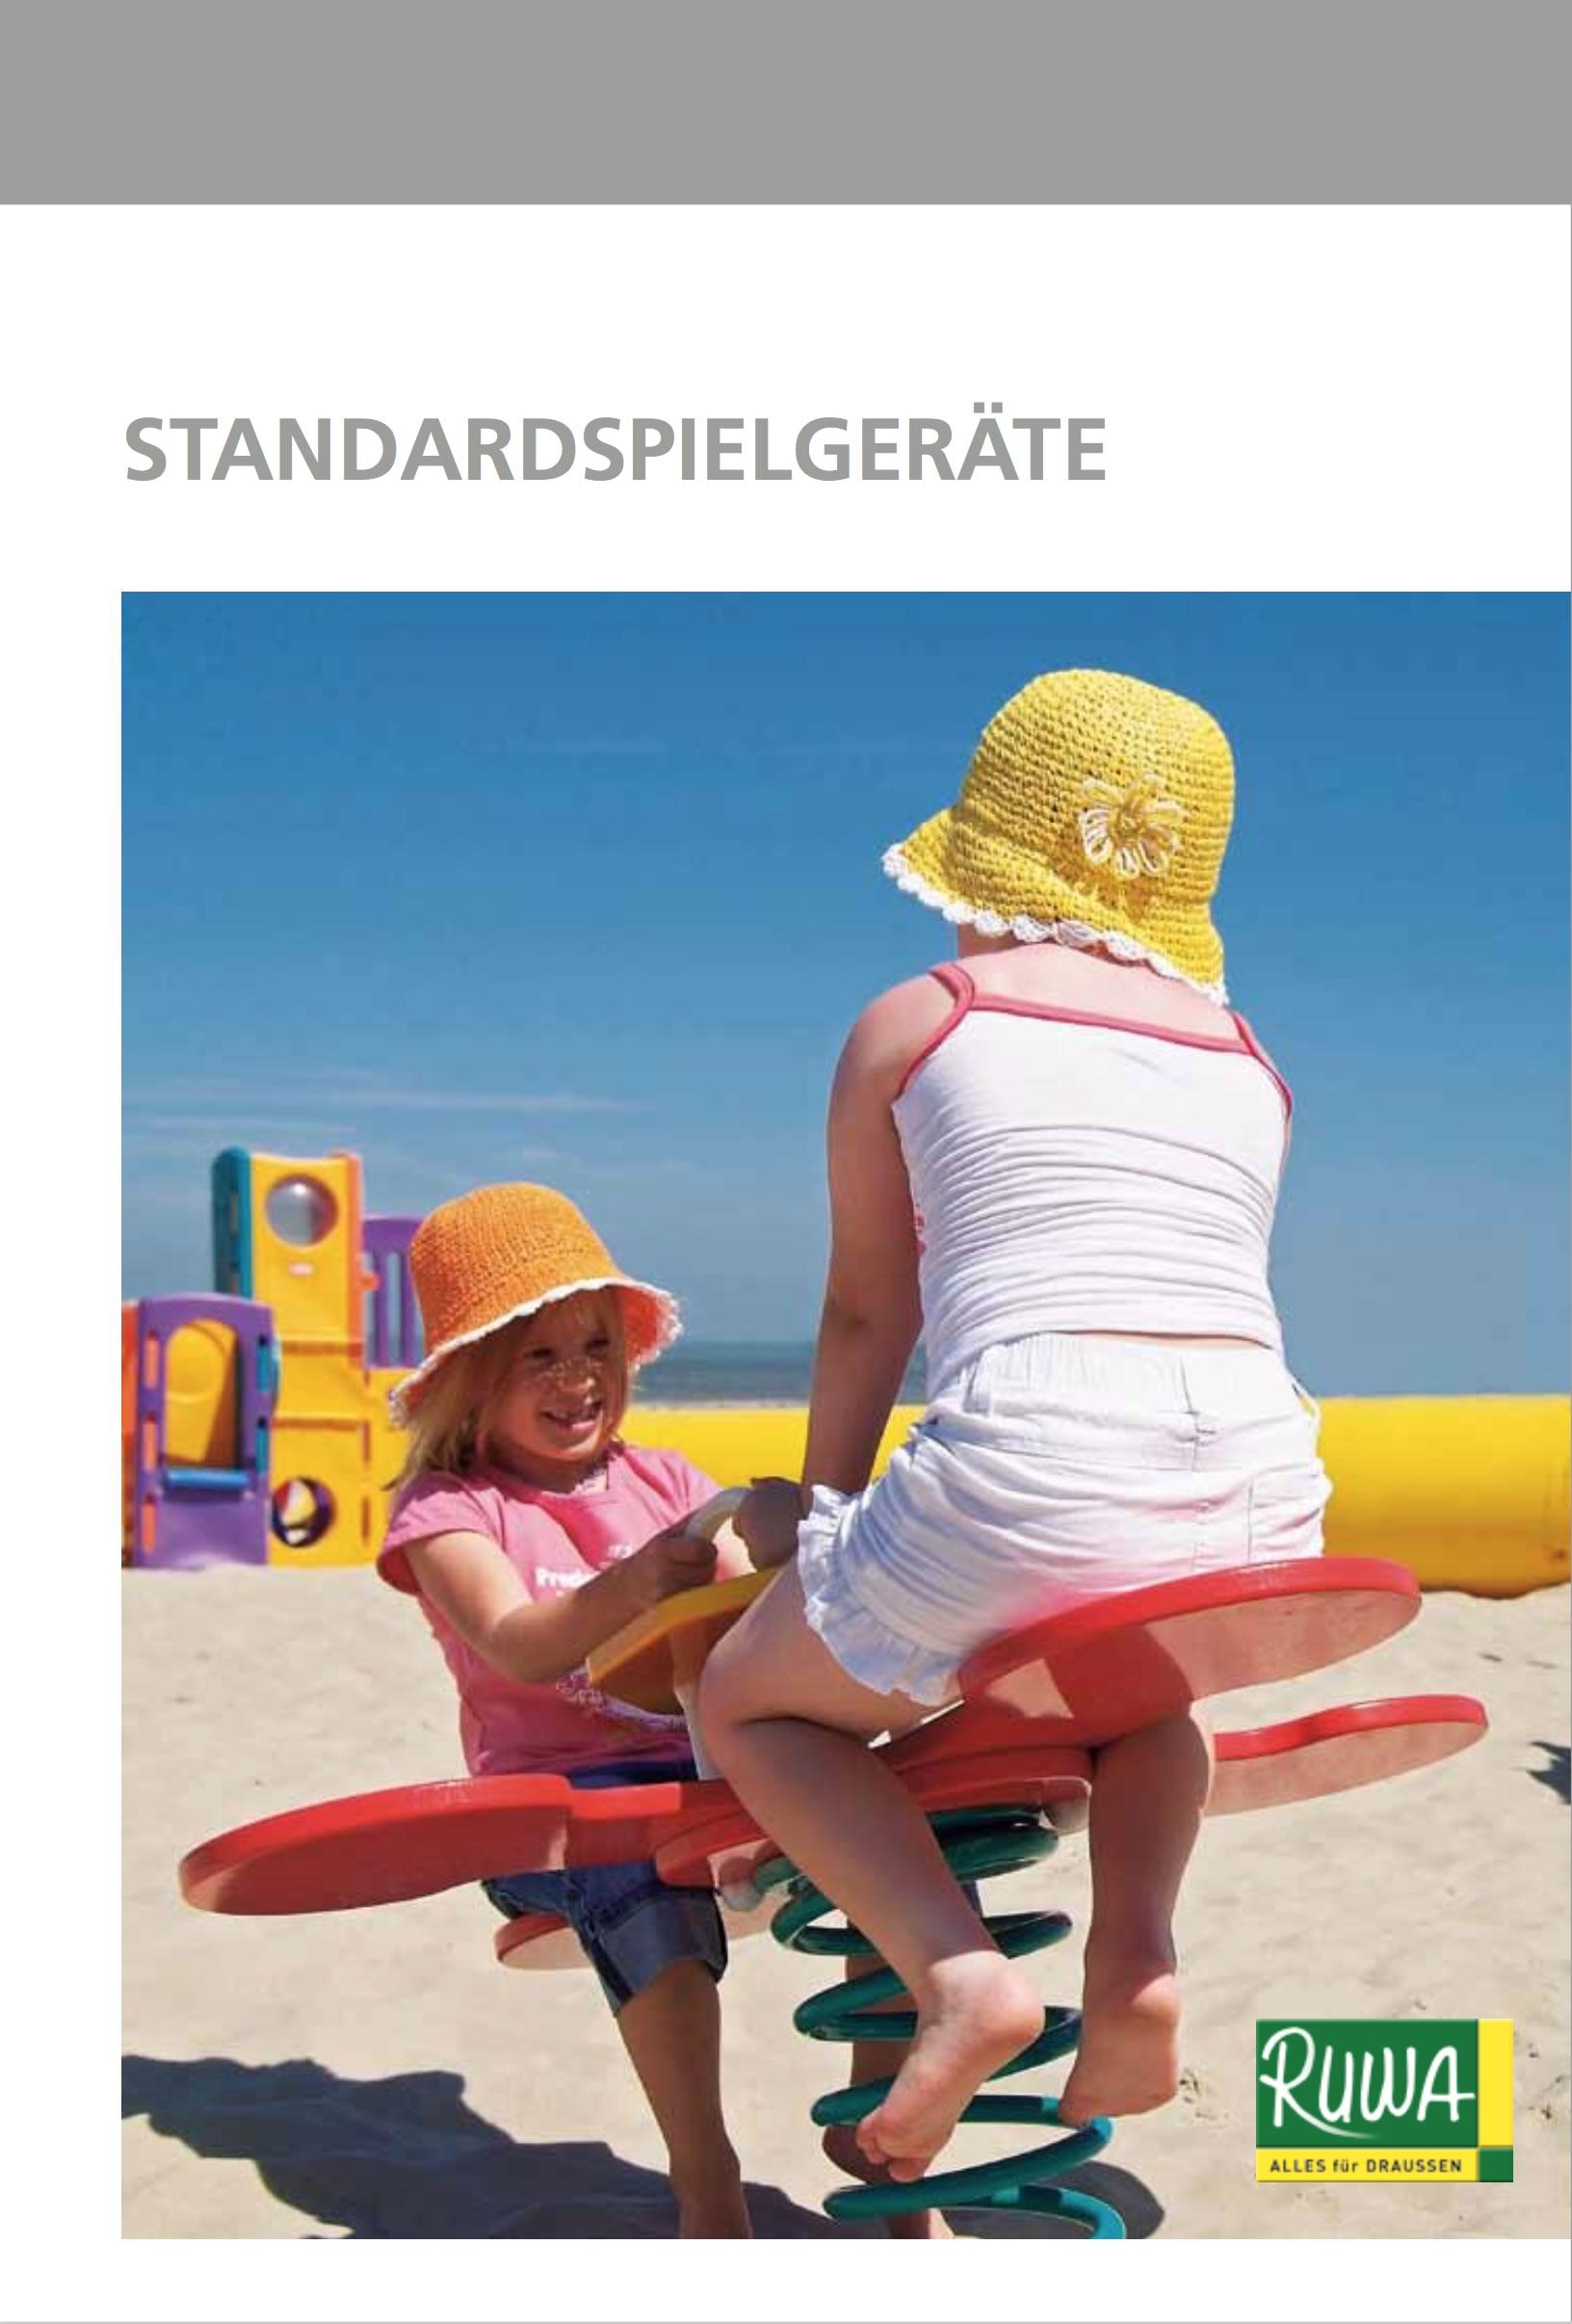 RUWA Blätterkatalog Standardspielgeräte